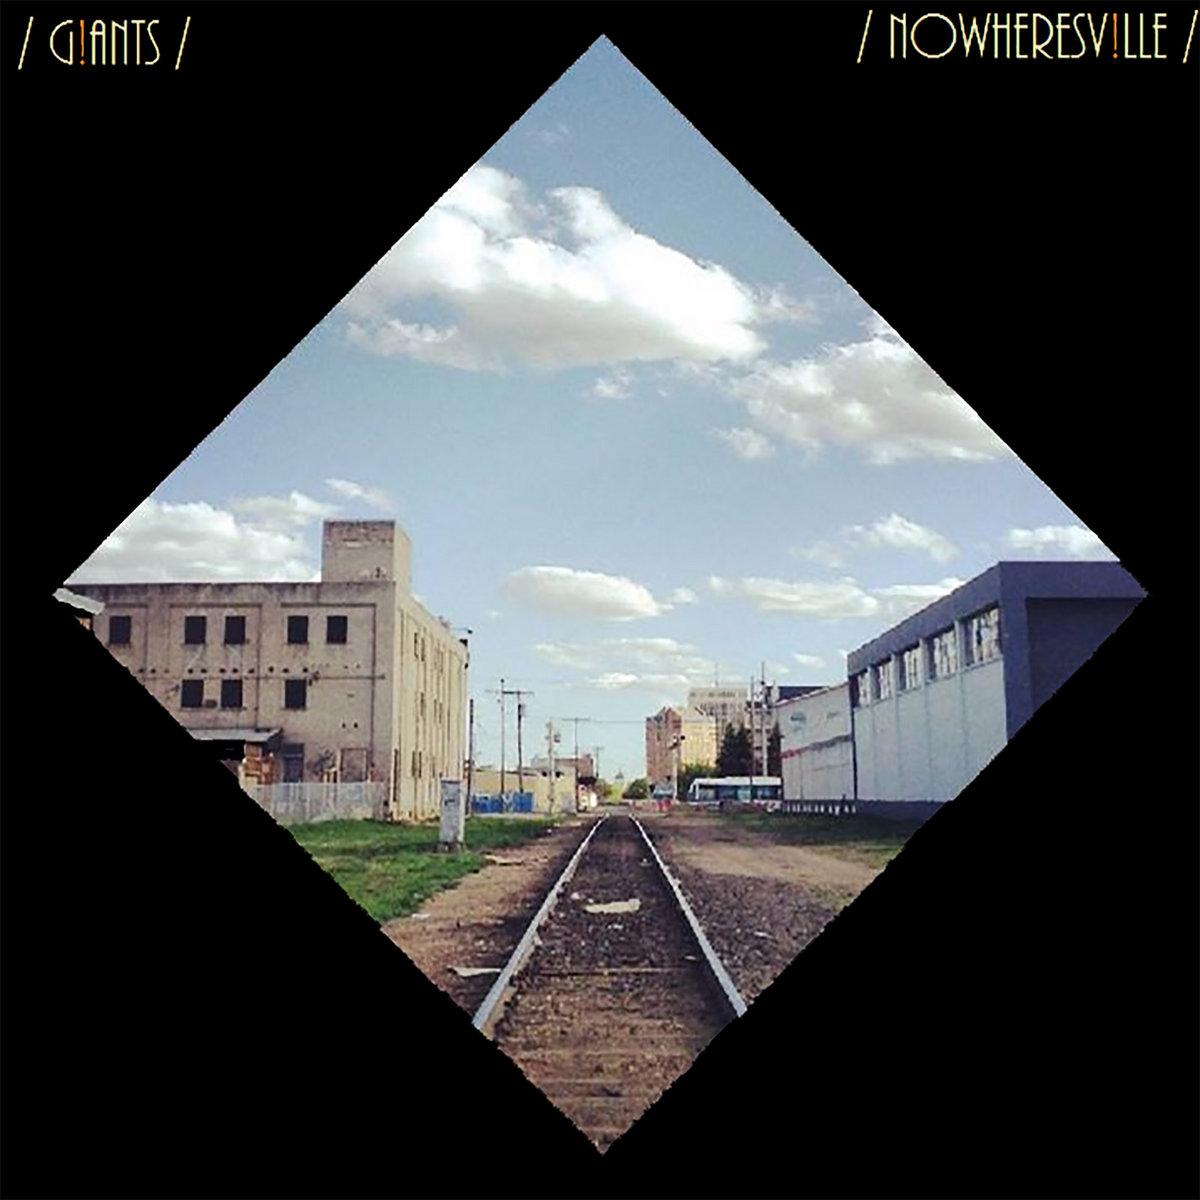 Giants - Nowheresville [EP] (2016)